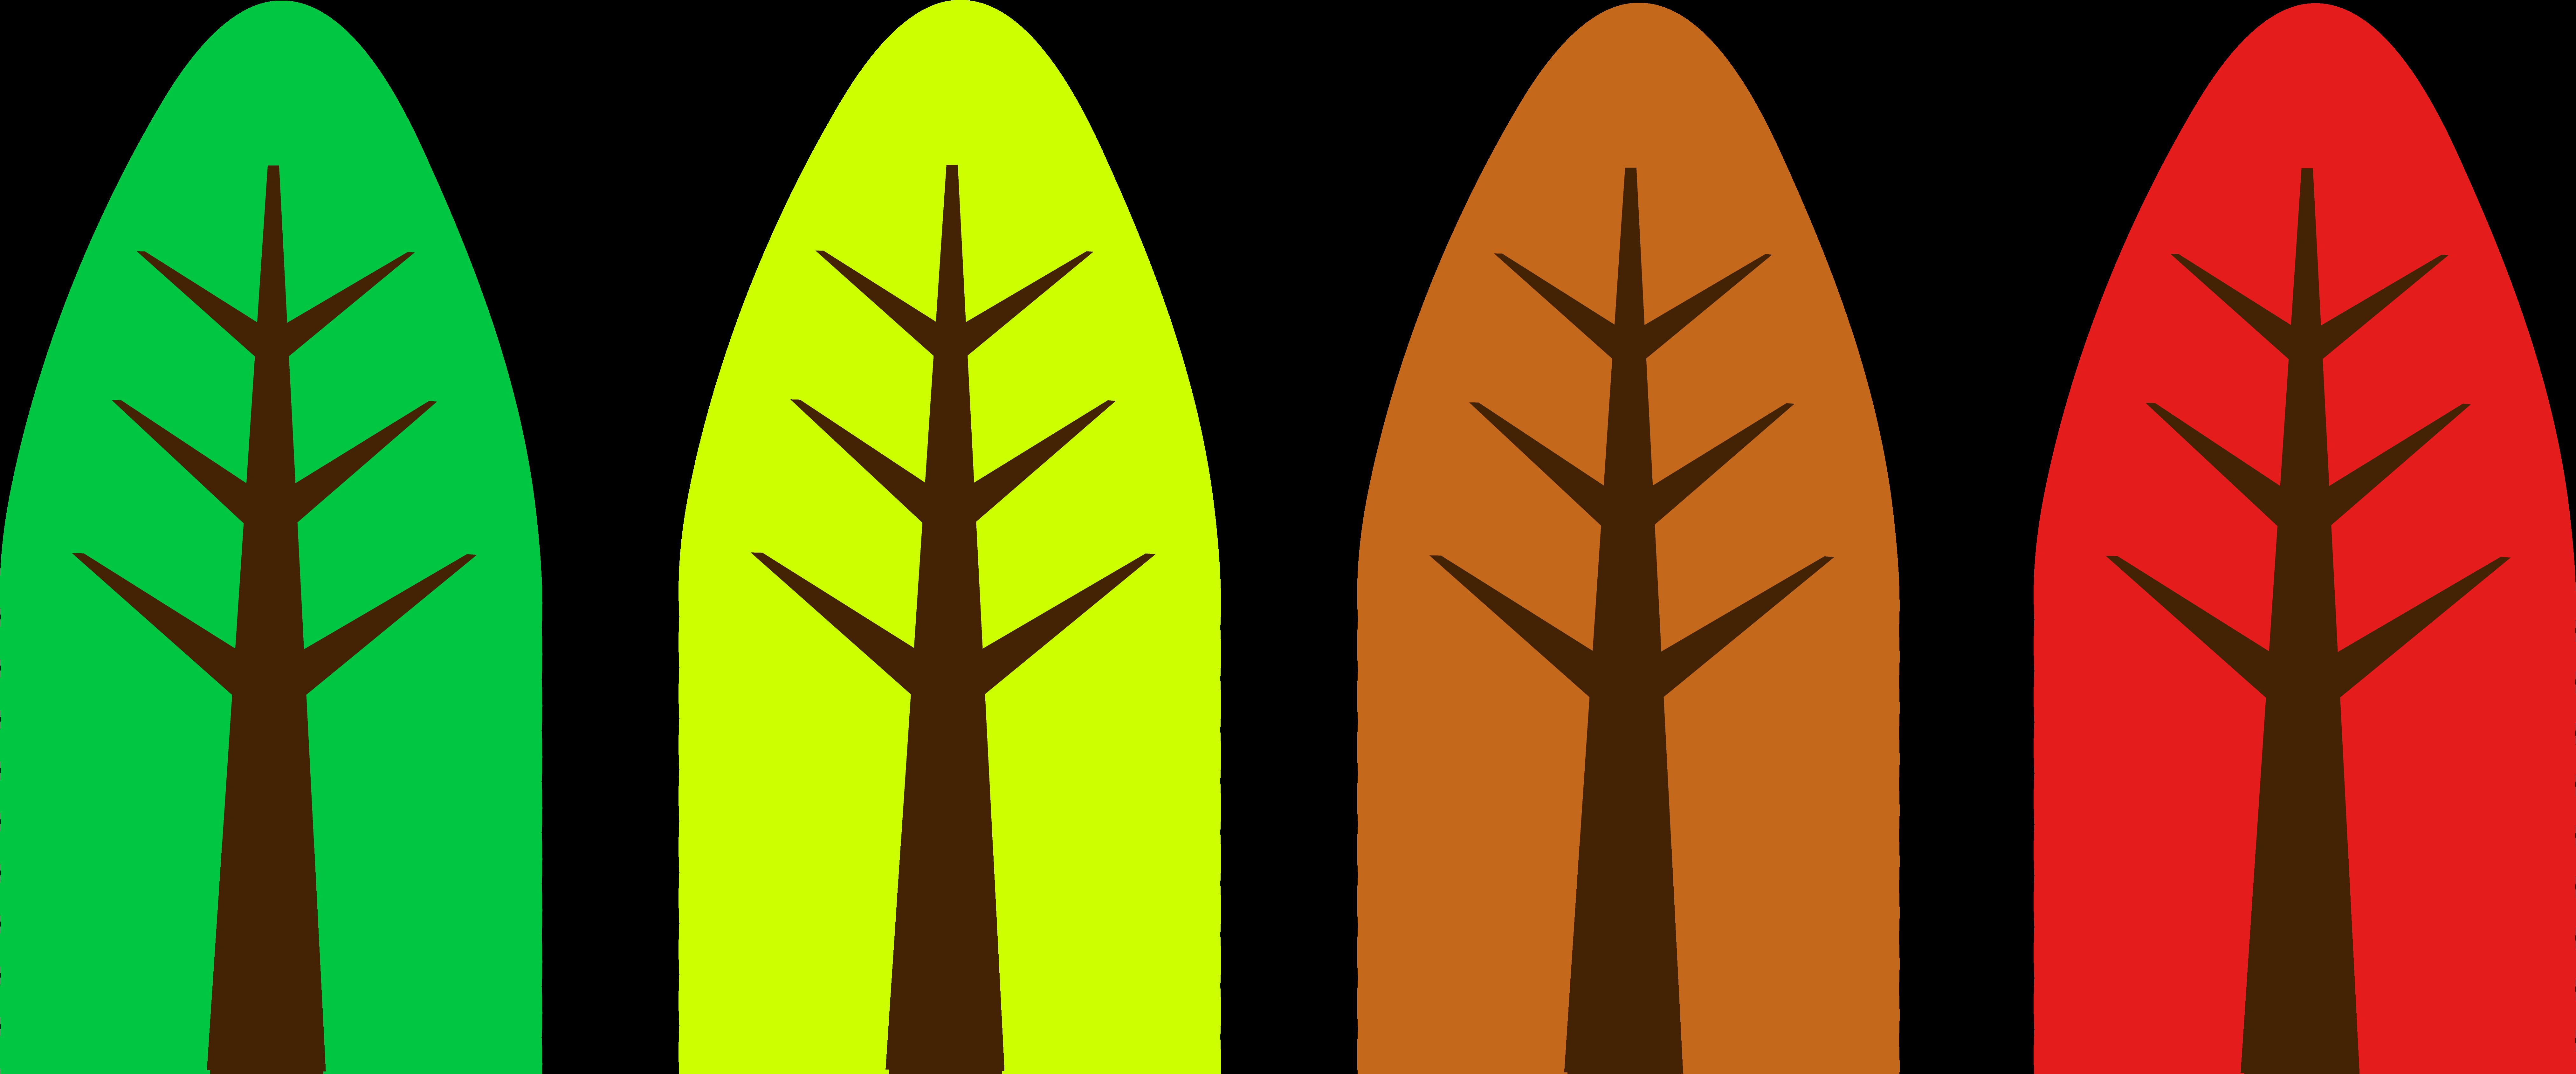 Season tree clipart transparent download Cute Simple Tree Designs - Free Clip Art transparent download